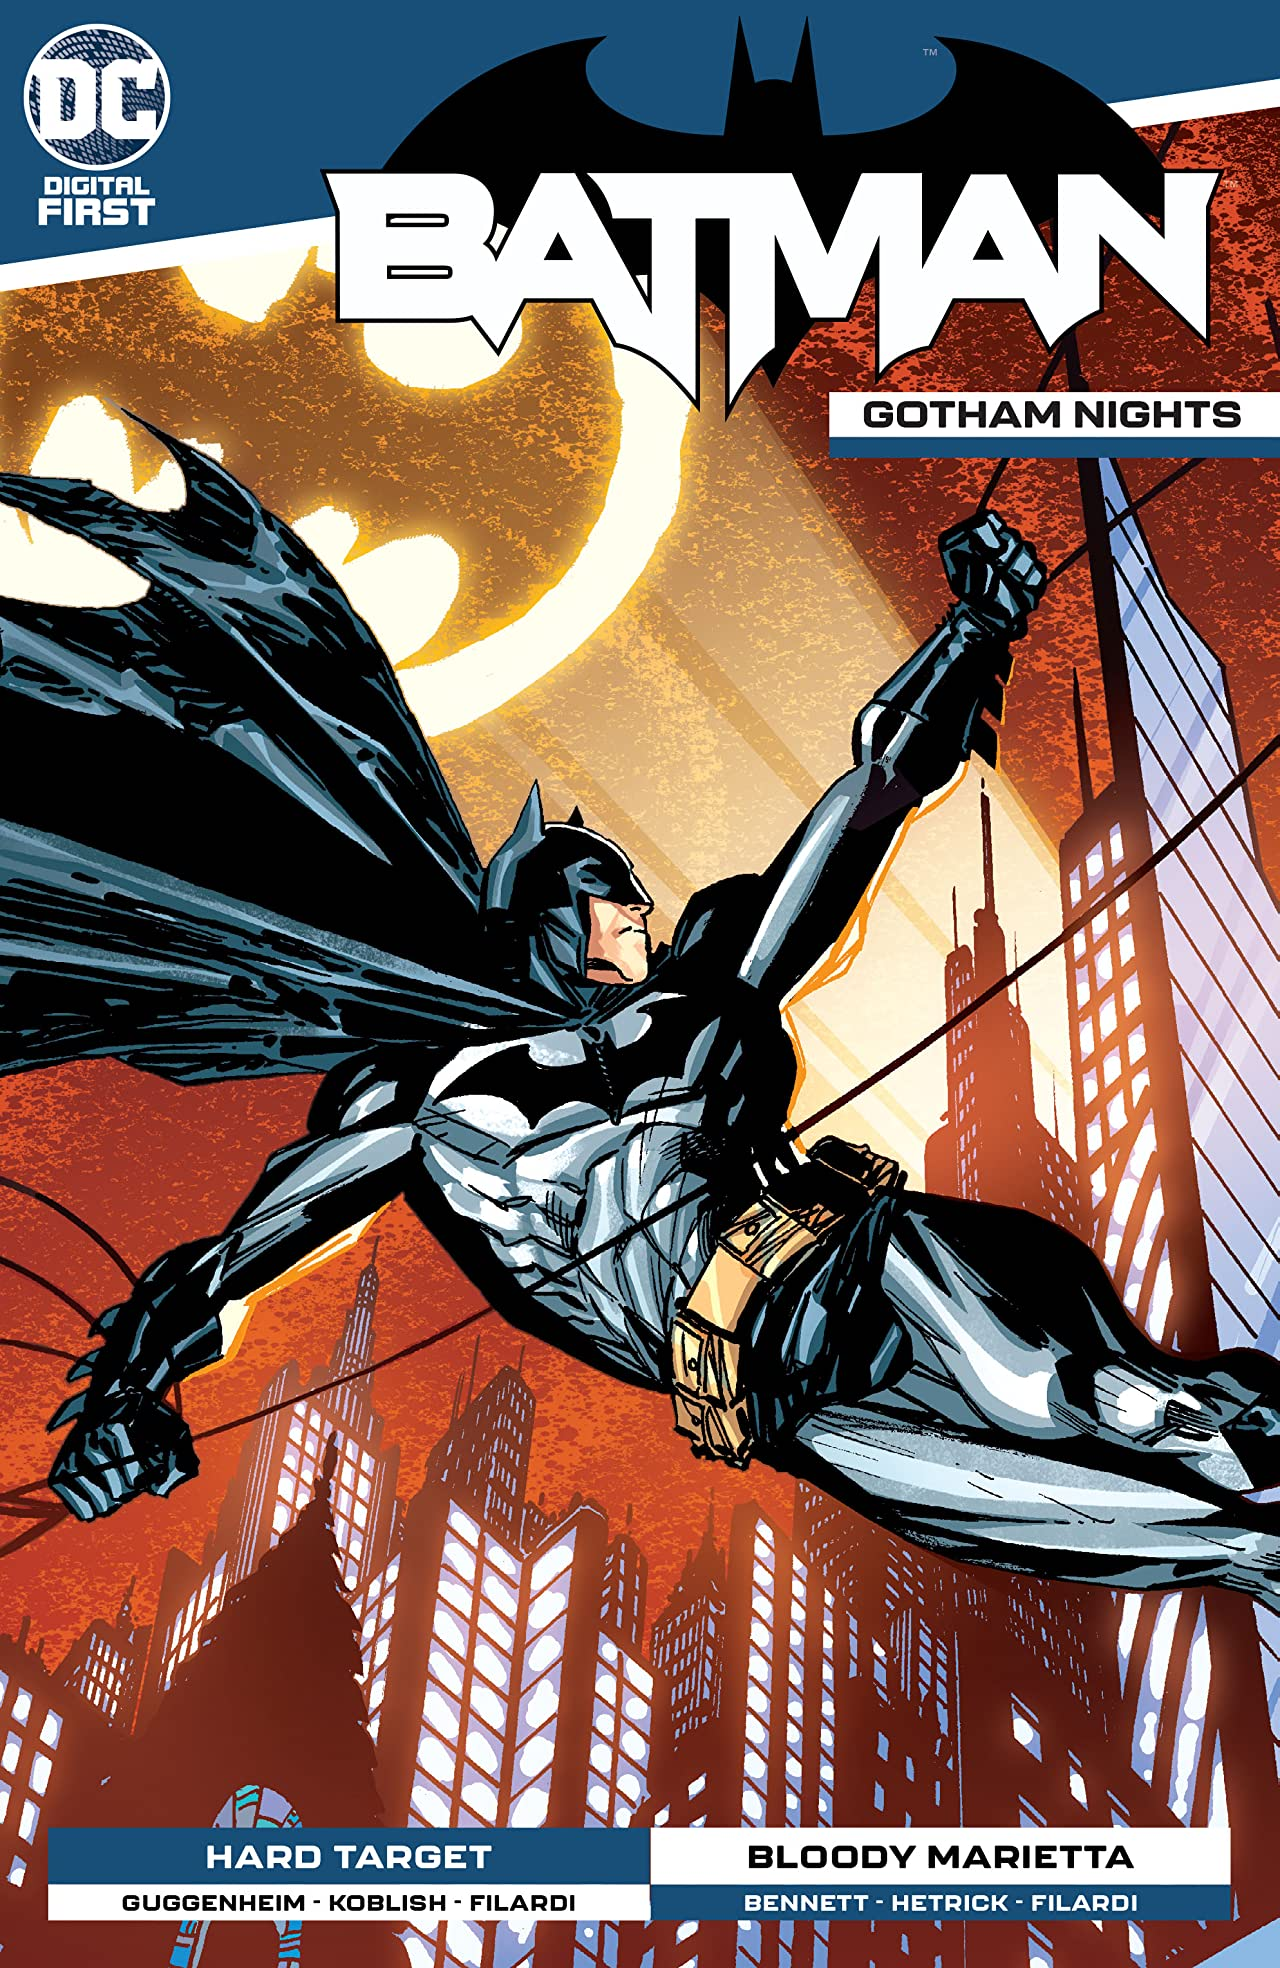 Batman: Gotham Nights No.18